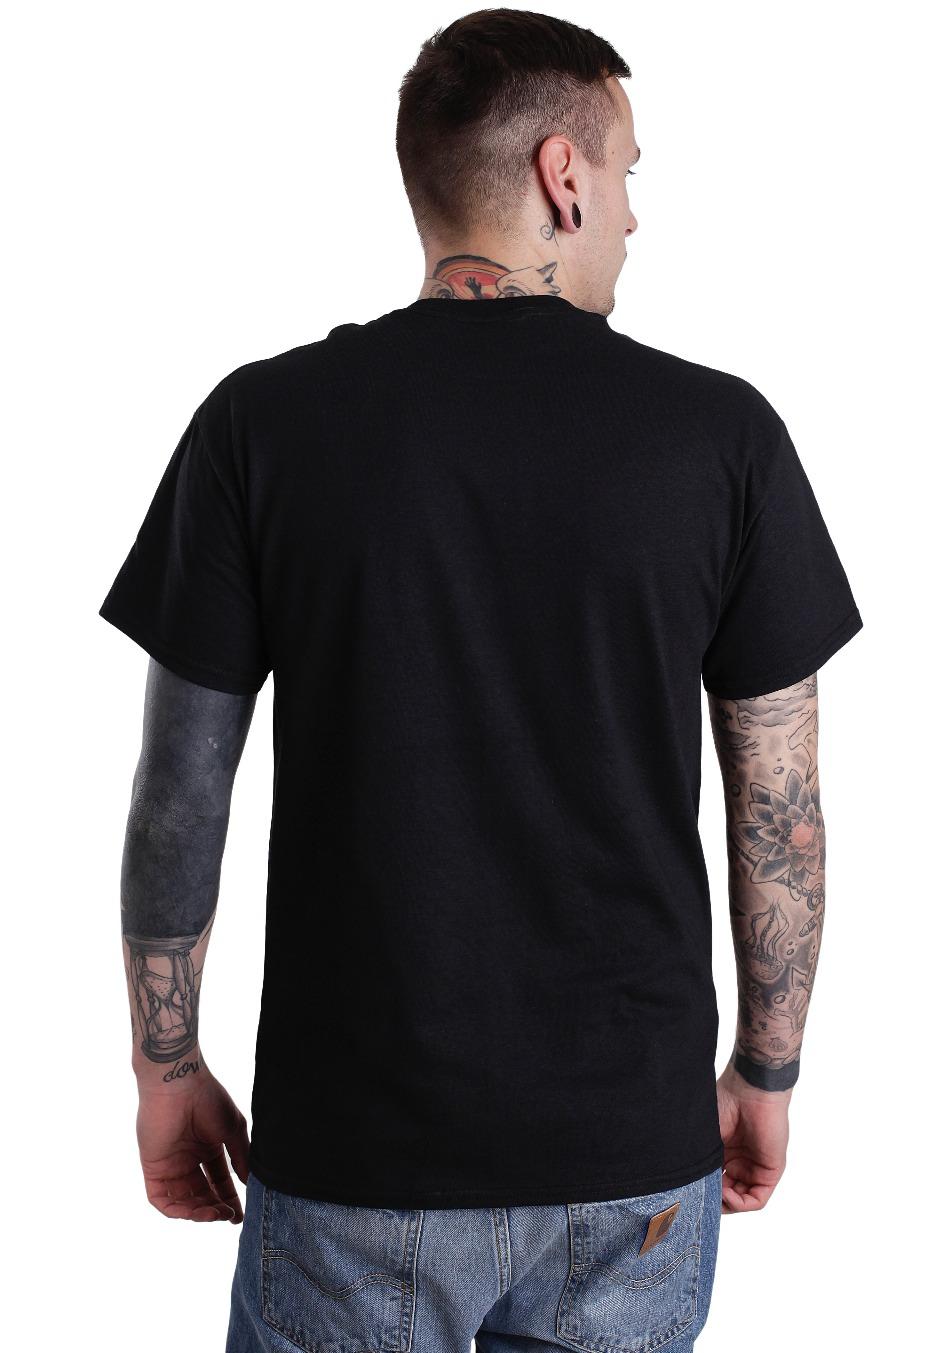 chelsea grin girl photo face t shirt official metalcore merchandise shop uk. Black Bedroom Furniture Sets. Home Design Ideas